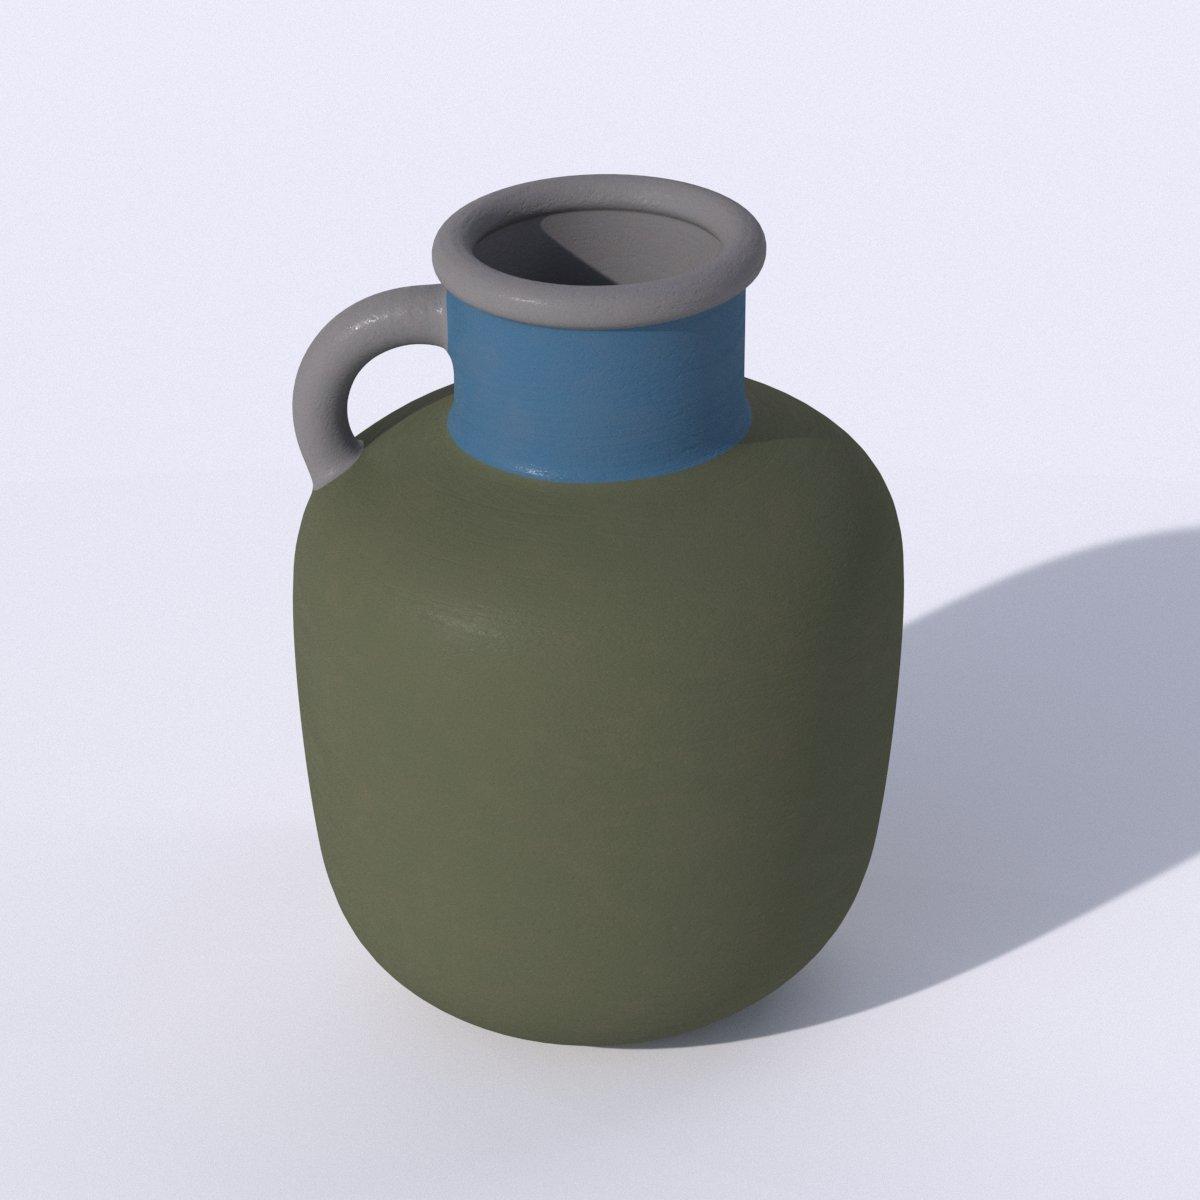 Ikea Ypperling Green Vase 3d Model In Decoration 3dexport